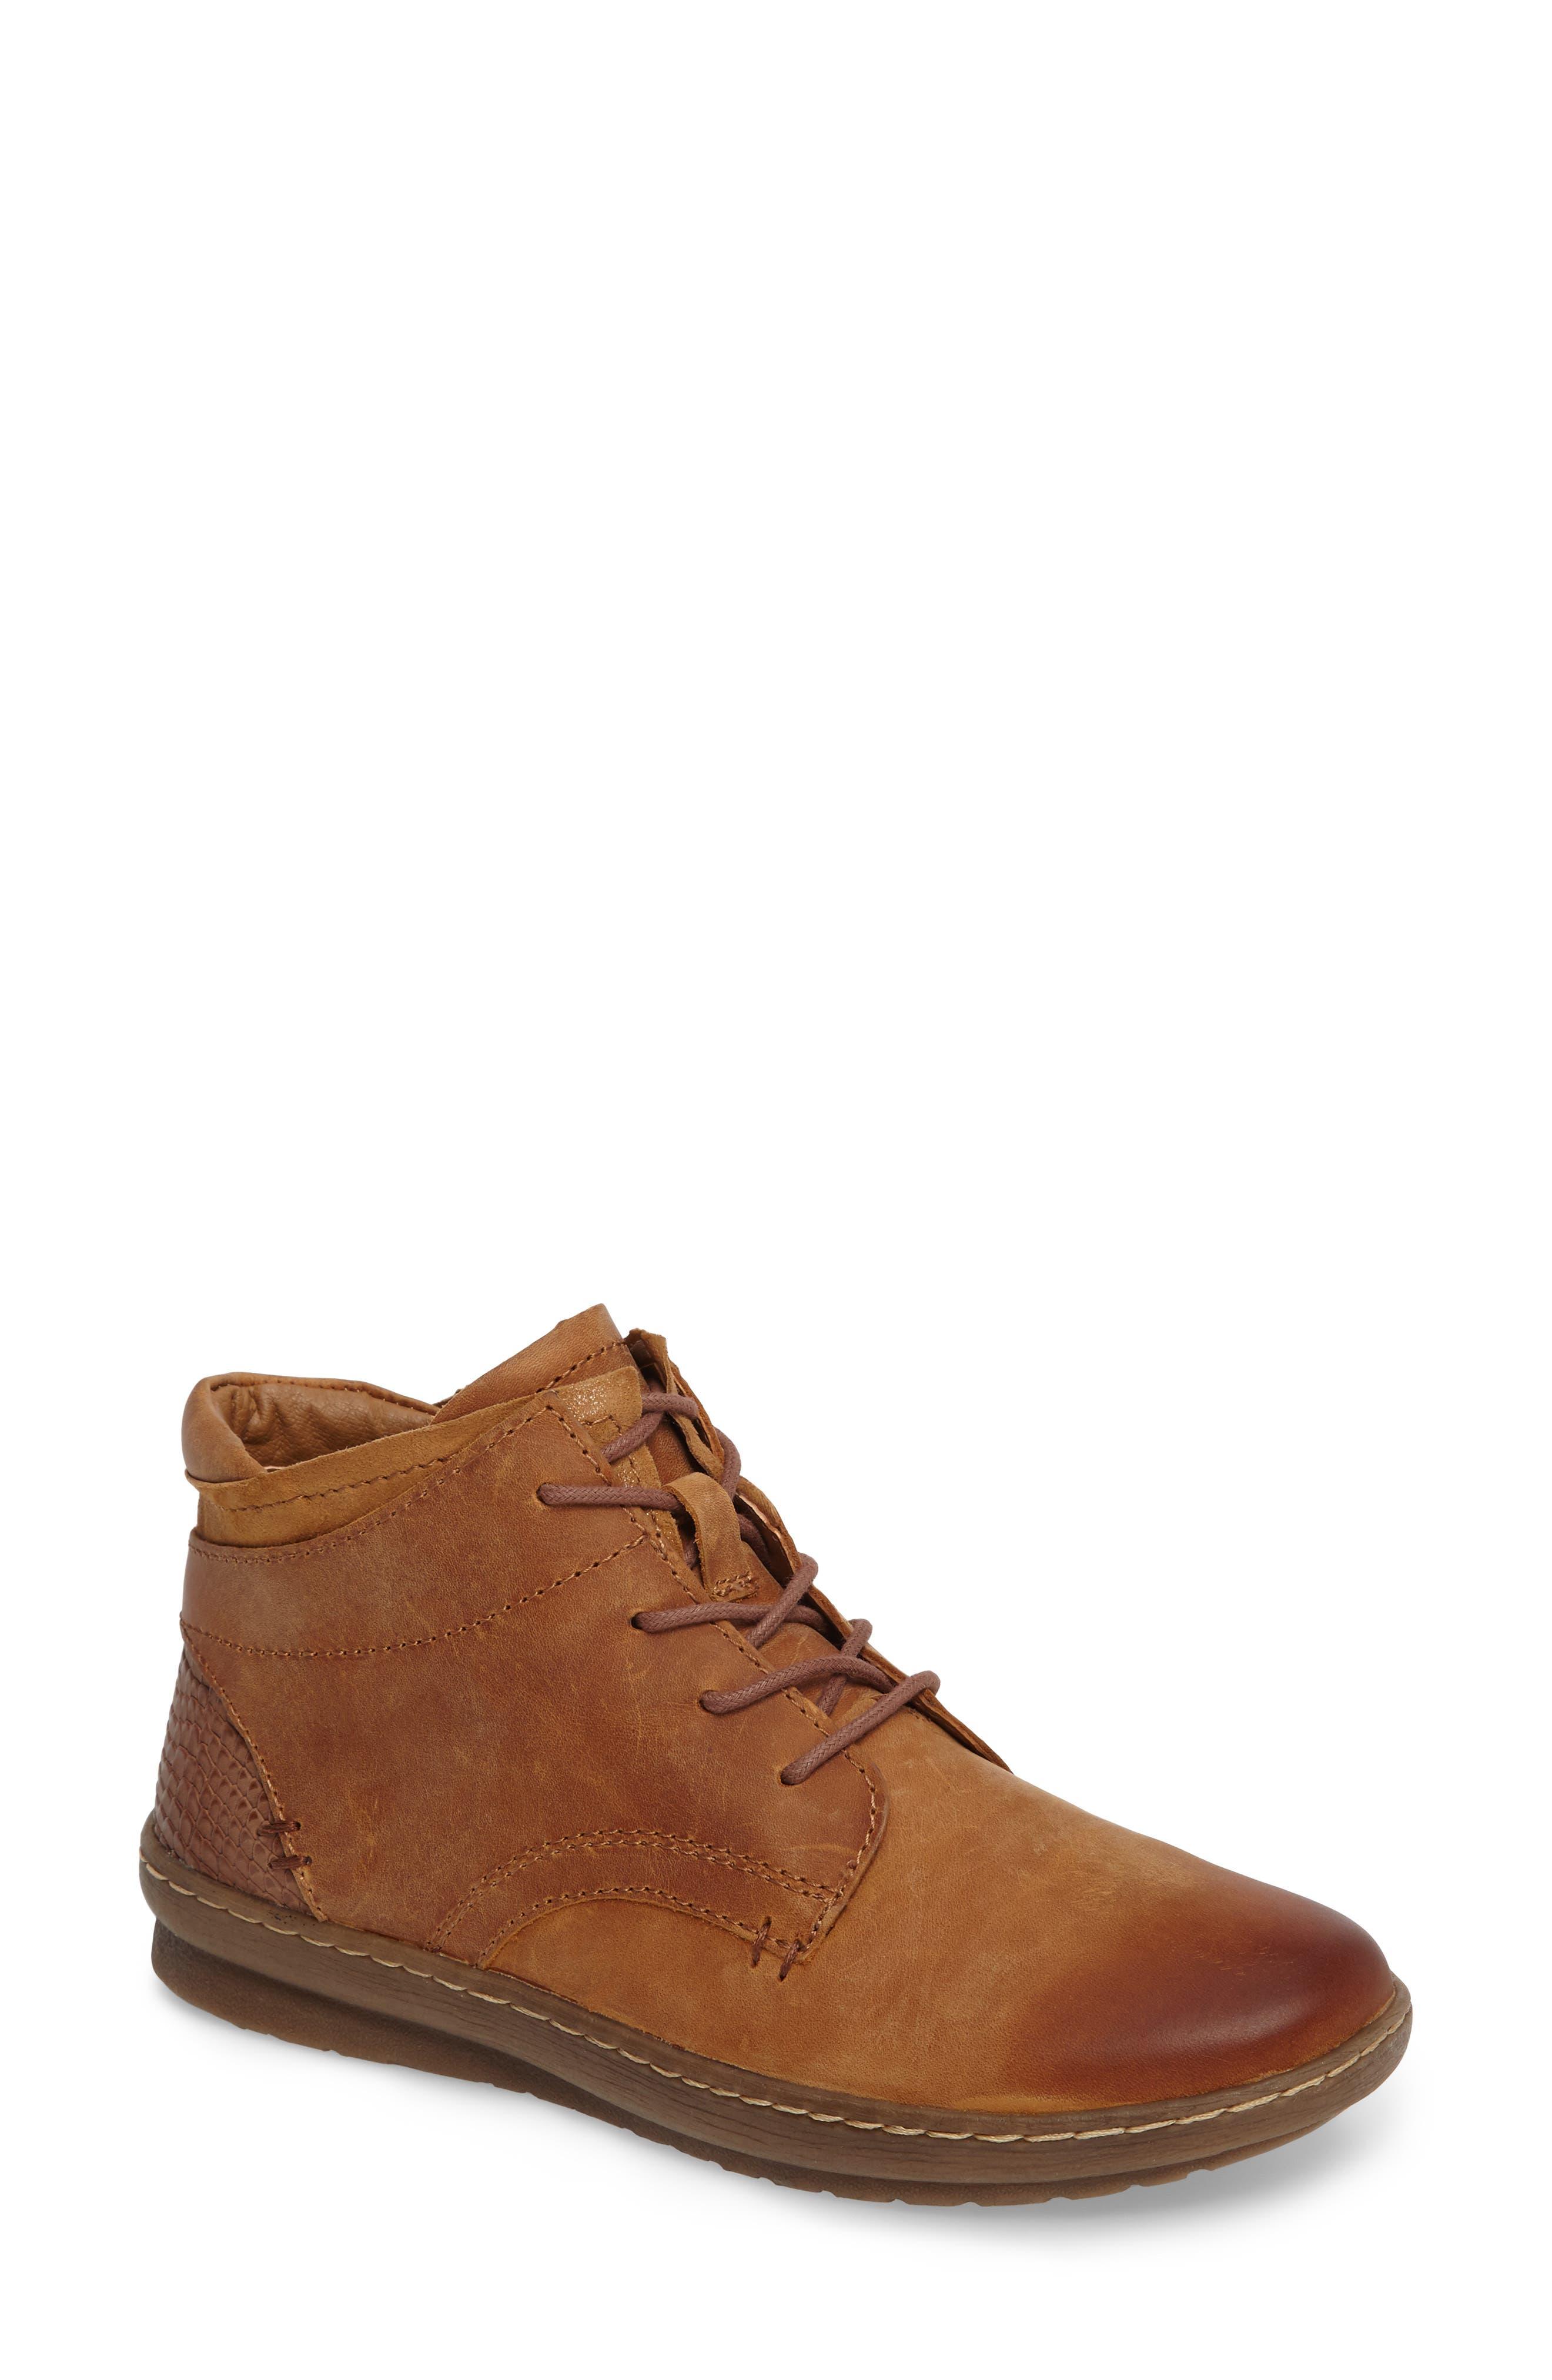 Cascade Boot,                             Main thumbnail 1, color,                             Almond Tan Leather